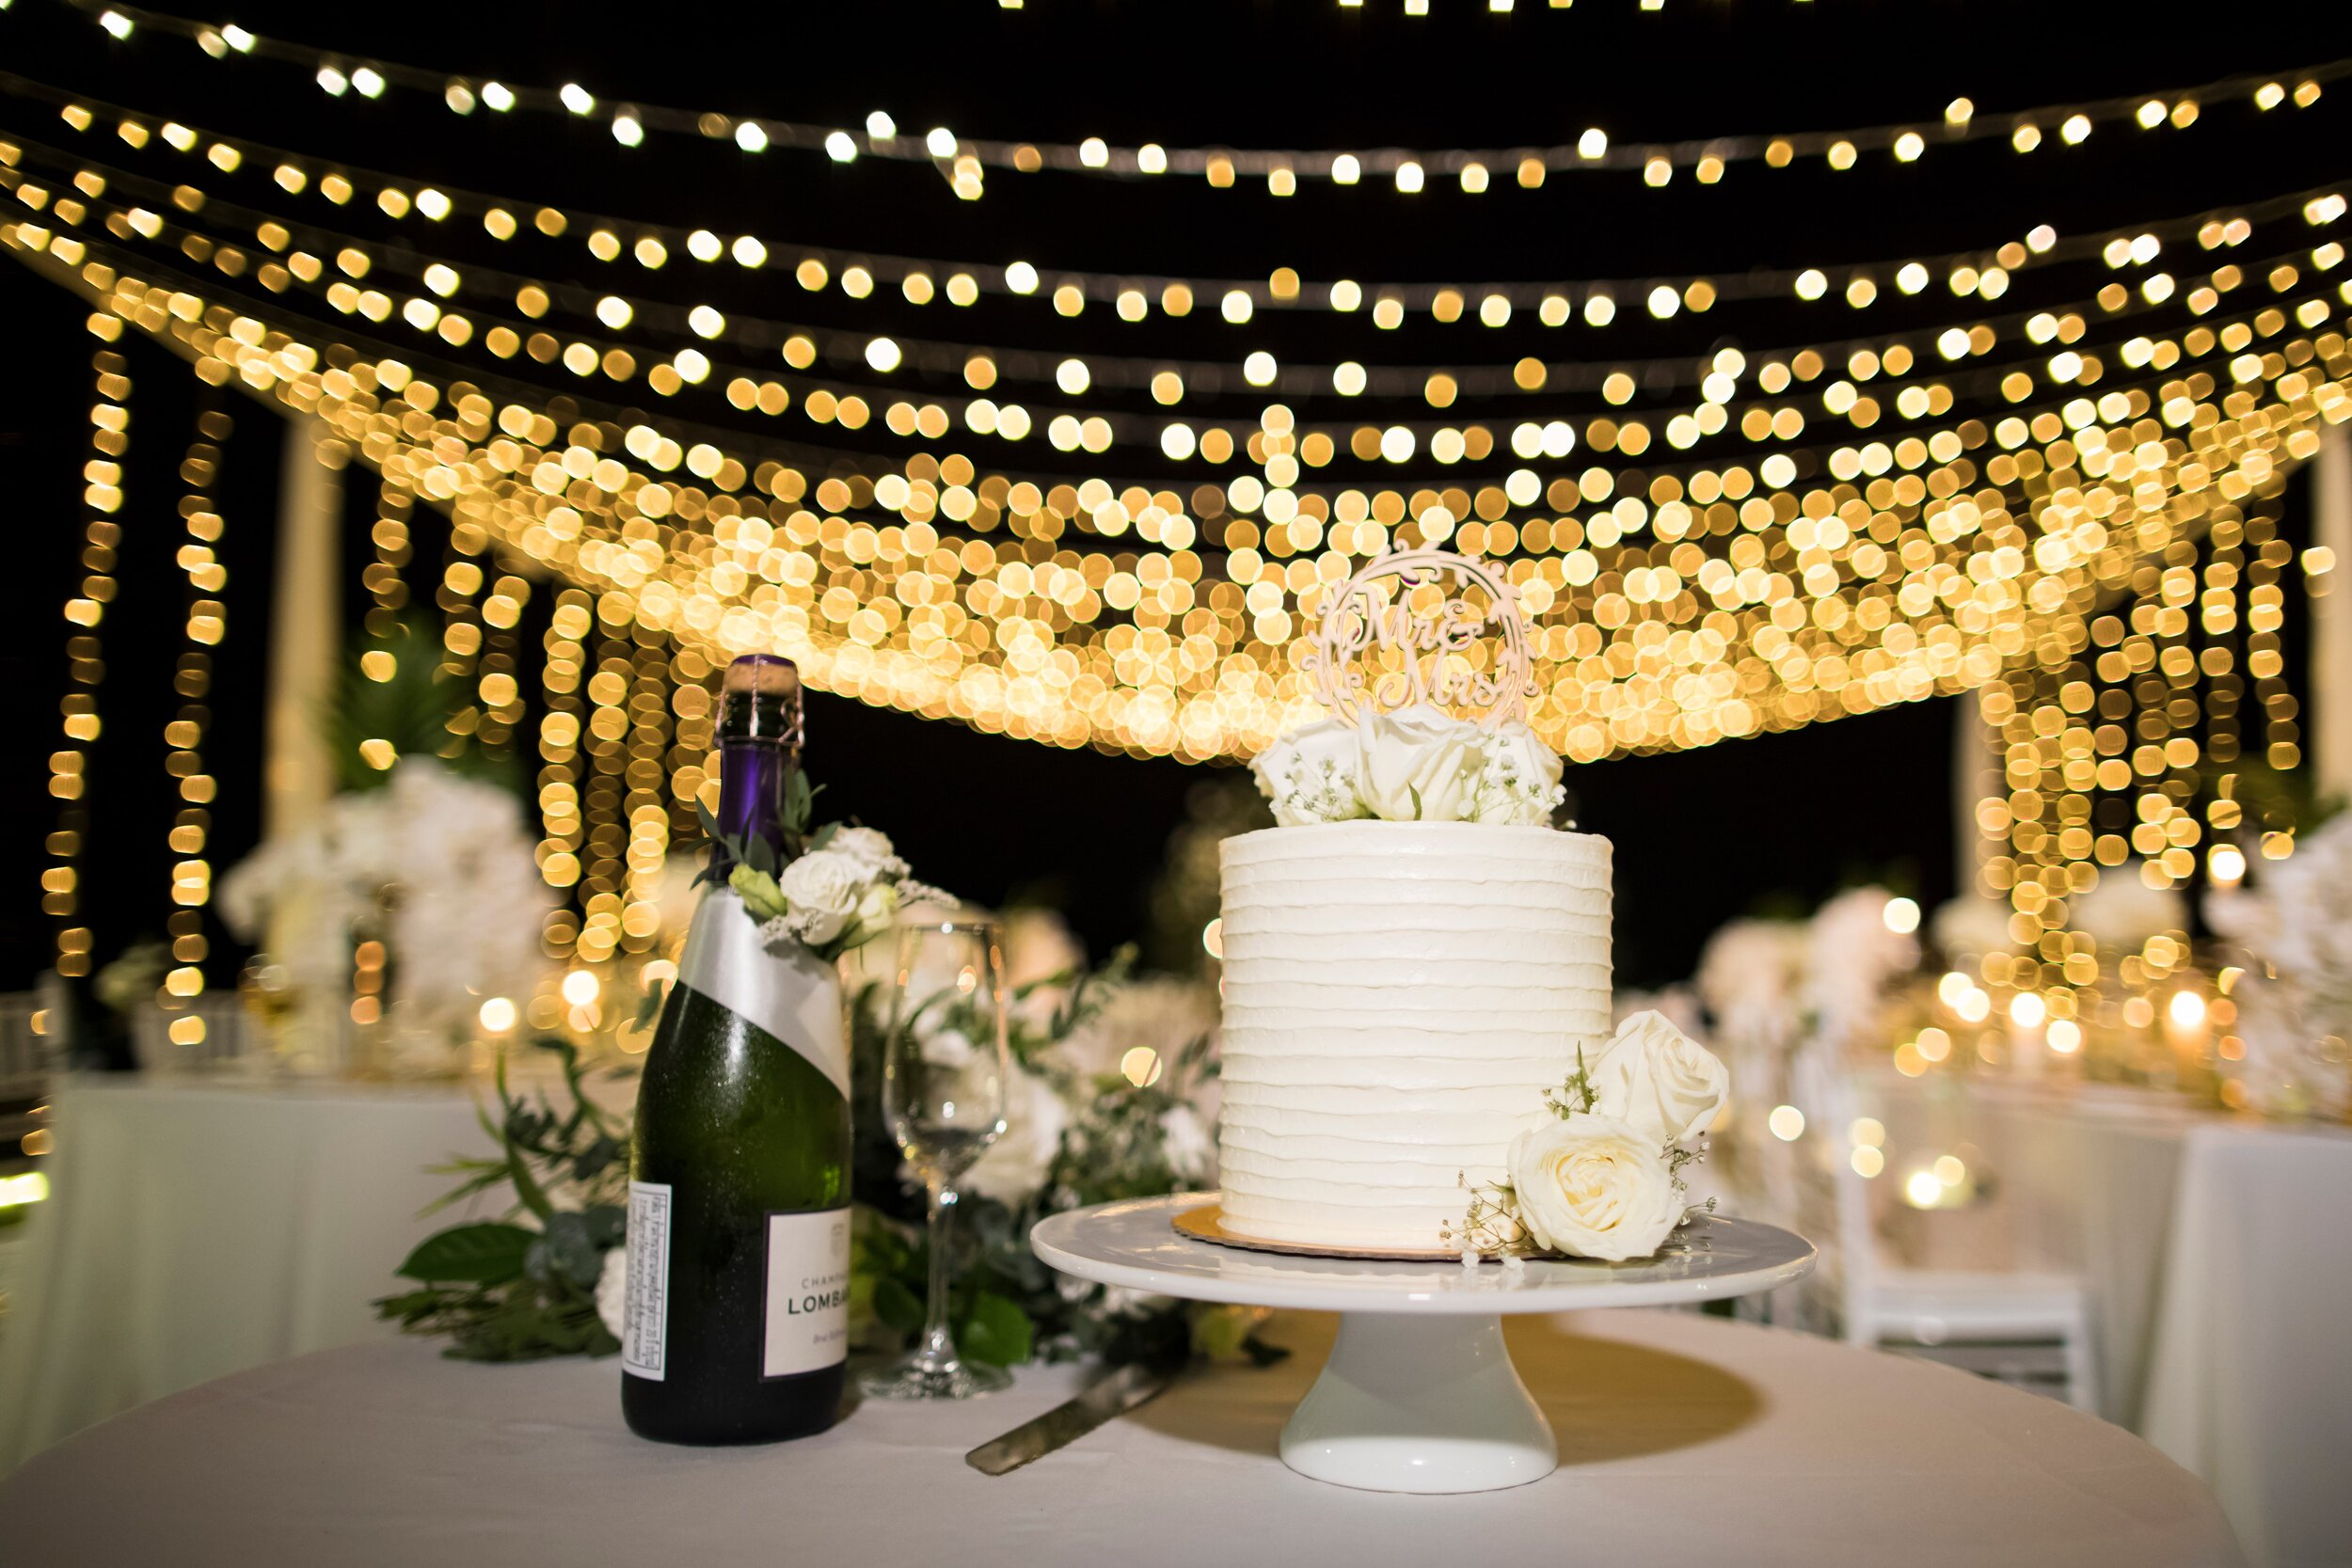 Decorative Lighting - Add decorative lighting to your wedding reception